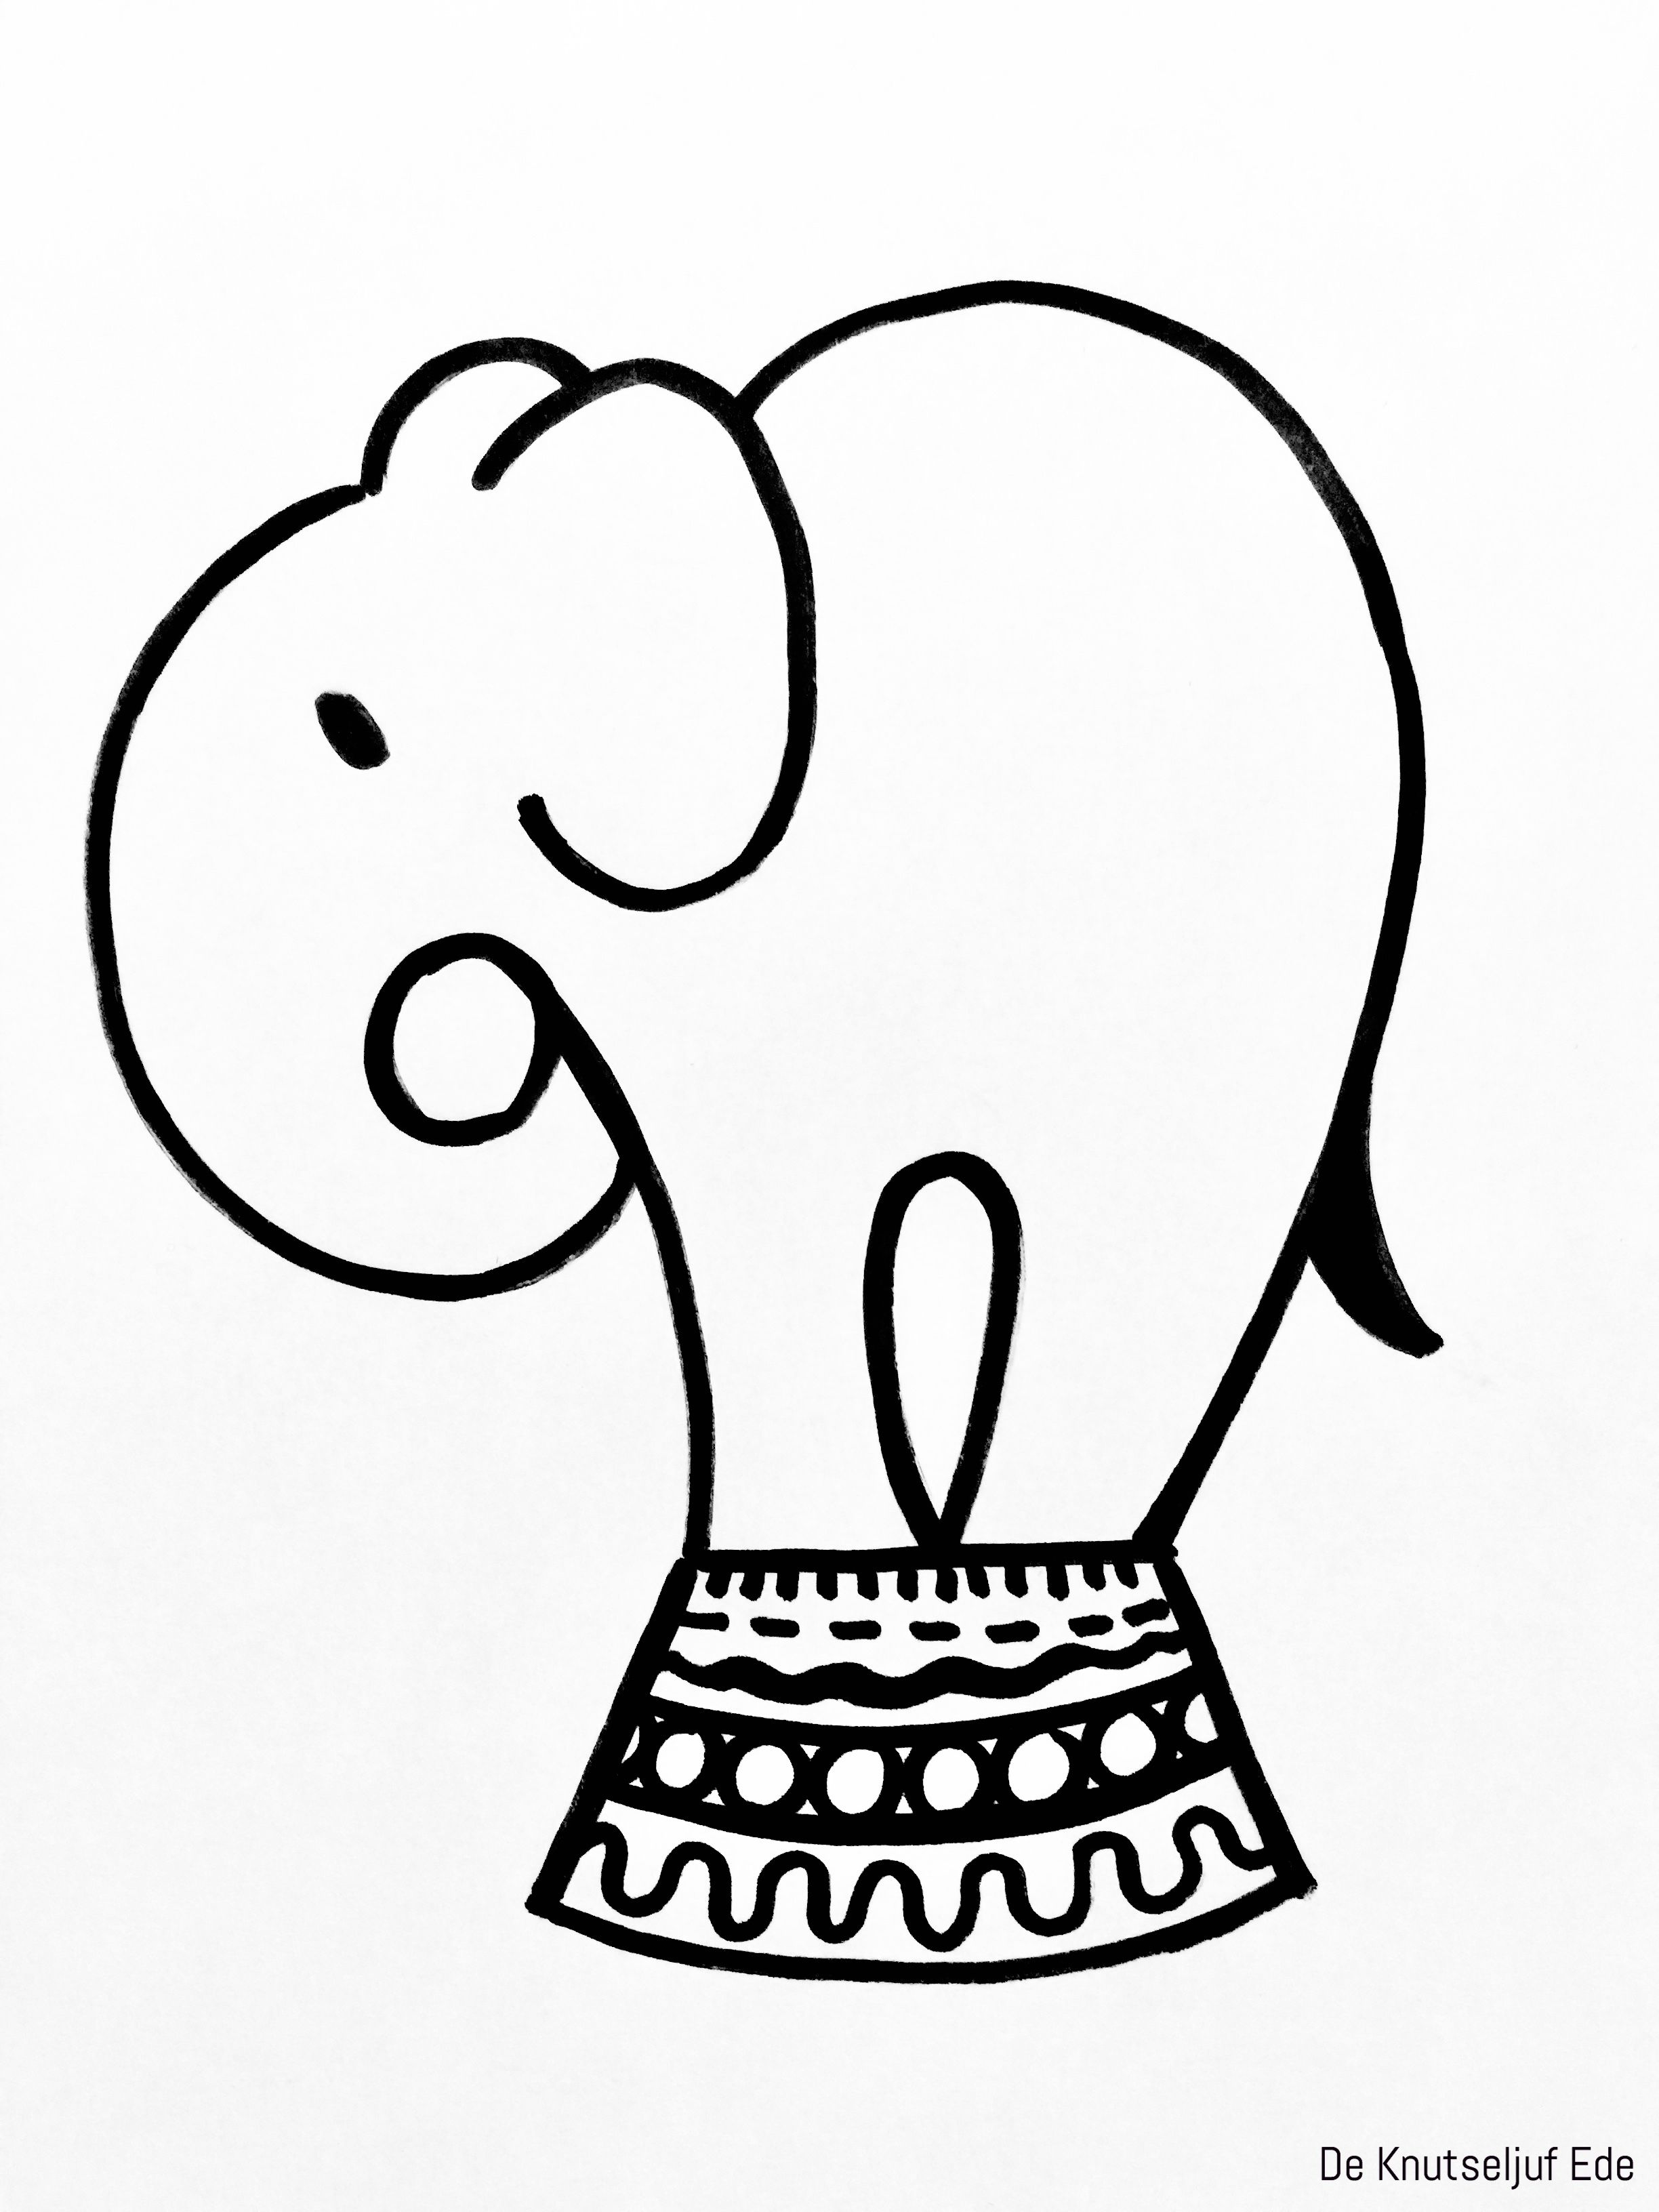 Circus Olifant Knutselen Van Karton En Wasknijpers Circus Knutsel Ideeen Knutseltips Circus 6 Olifant Knutselen Eenvoudige Tekeningen Circus Olifanten